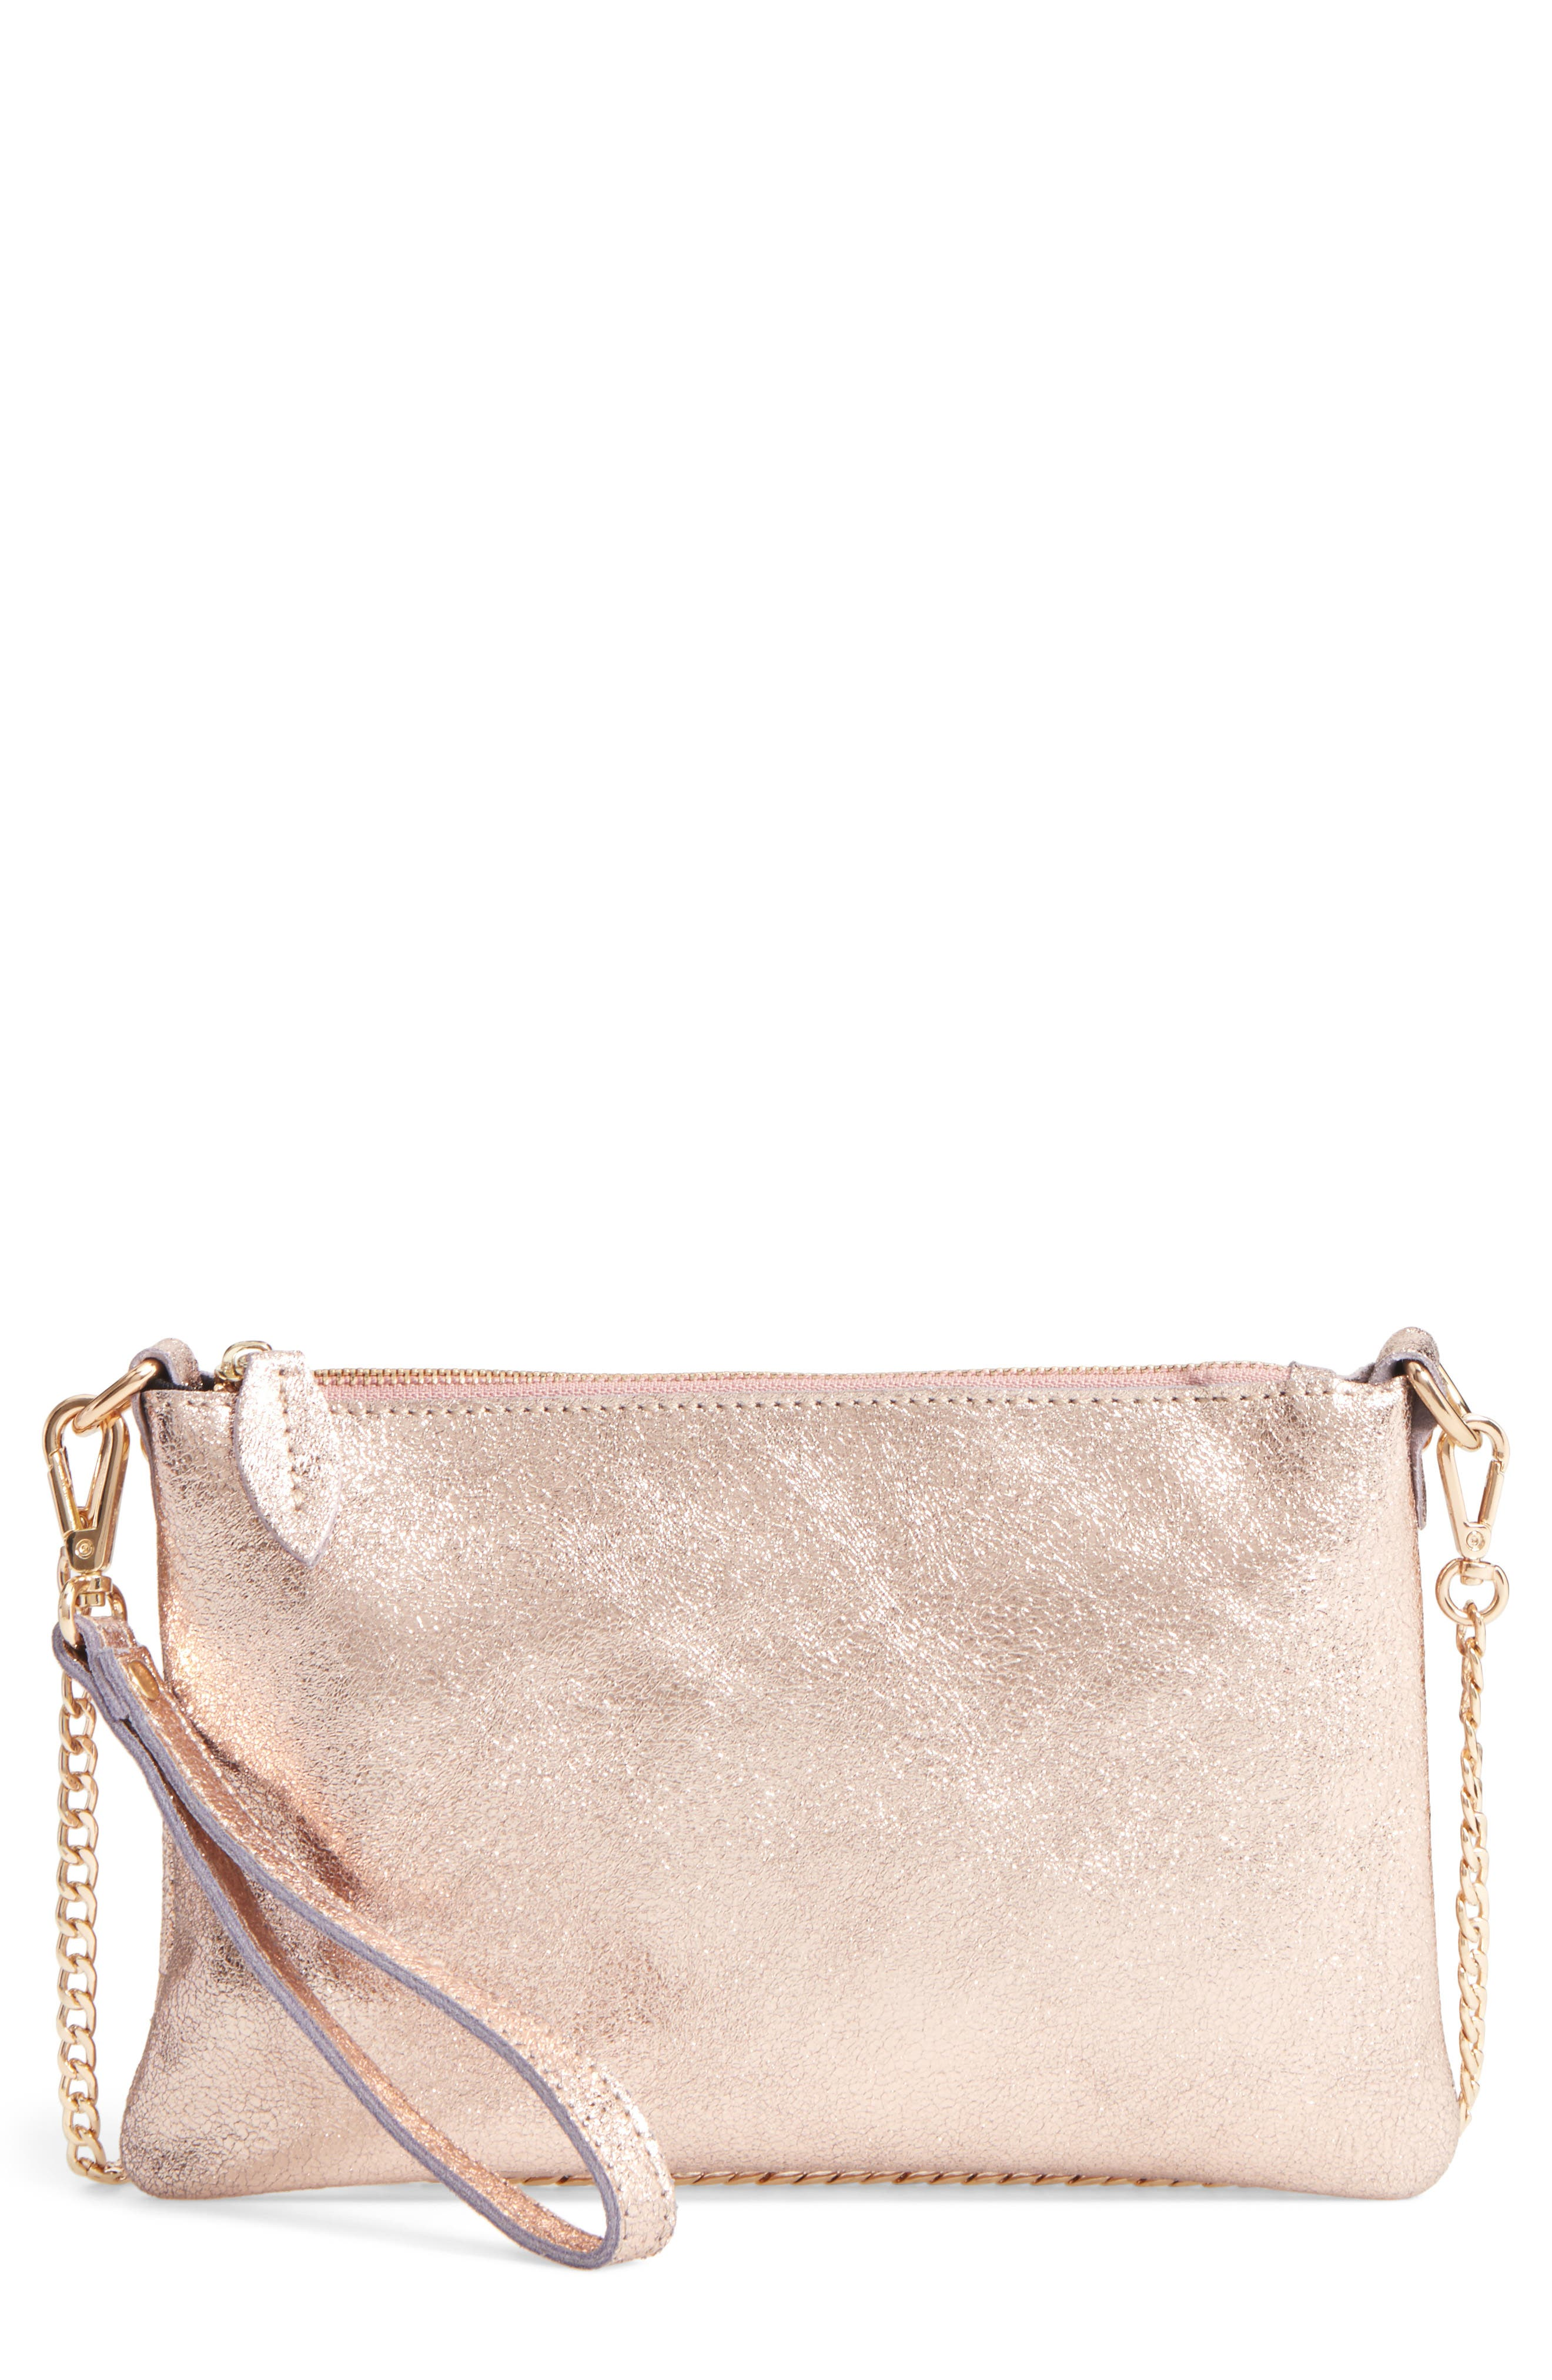 Street Level Leather Crossbody Bag